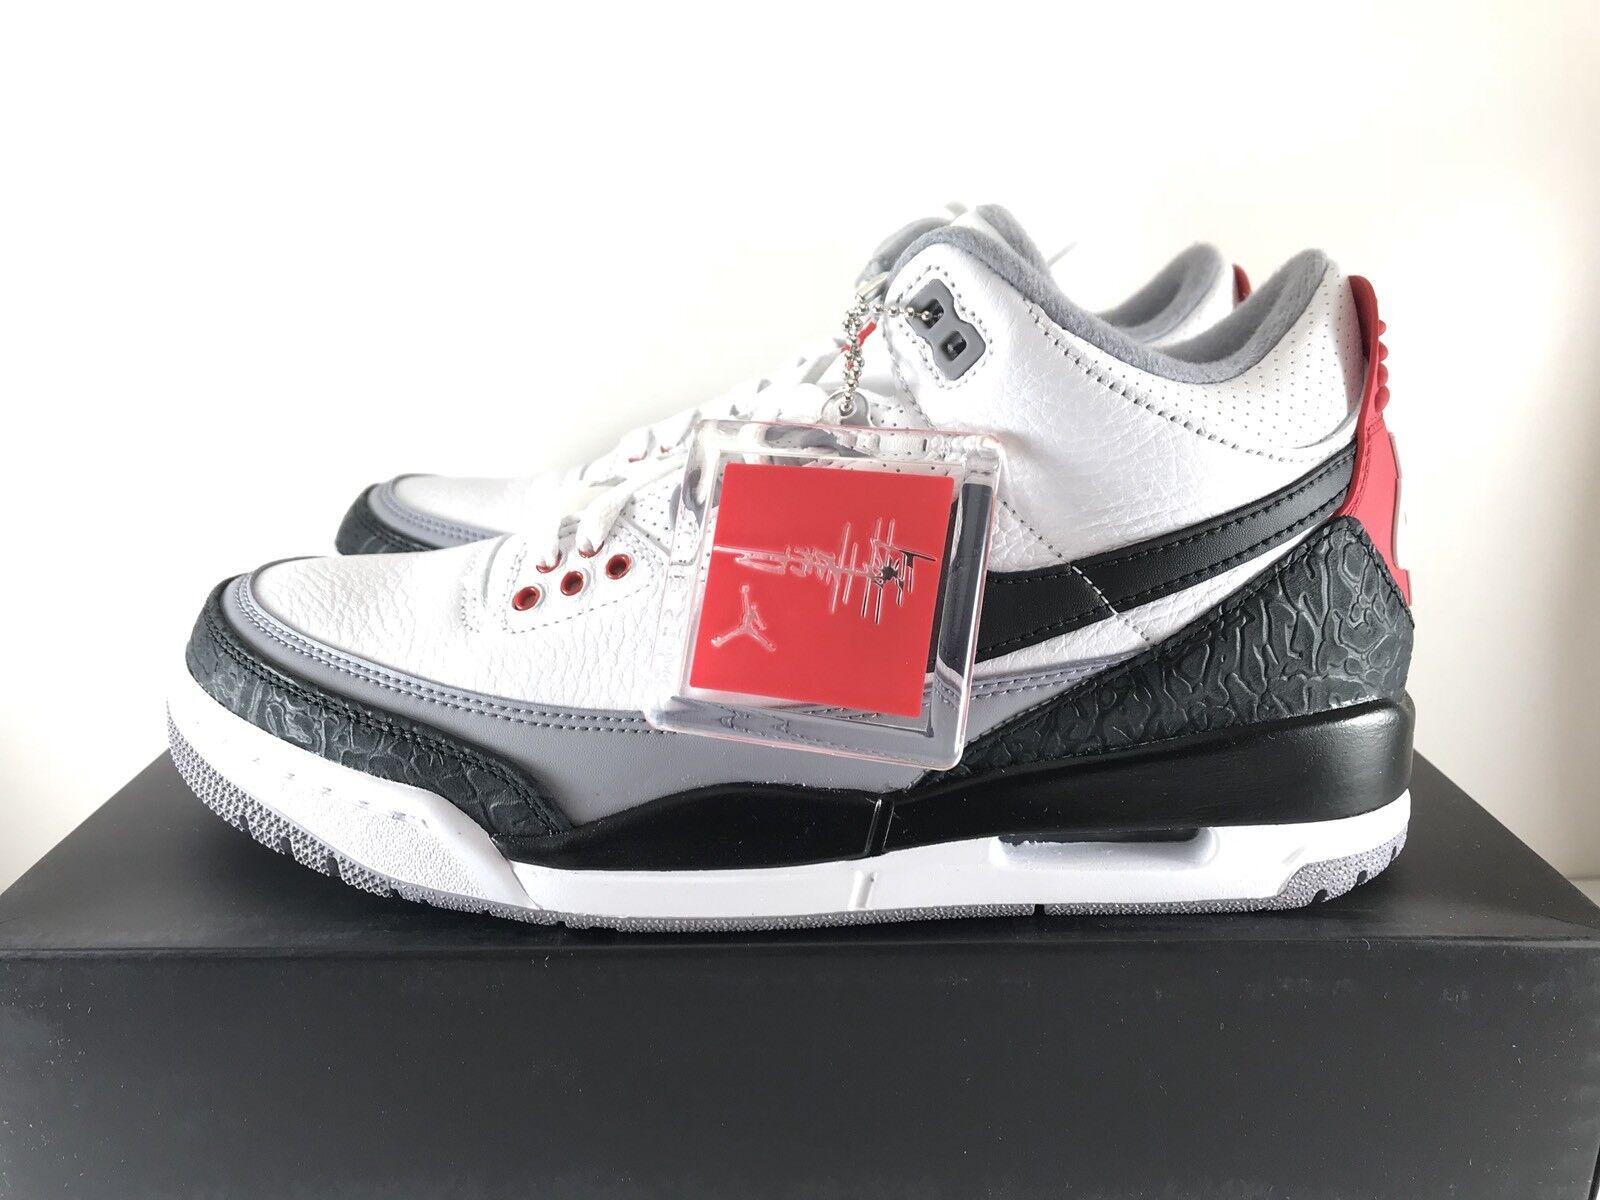 Nike Air Jordan Retro 3 NRG Tinker Hatfield Cement OG AQ3835-160 Mens Size 9